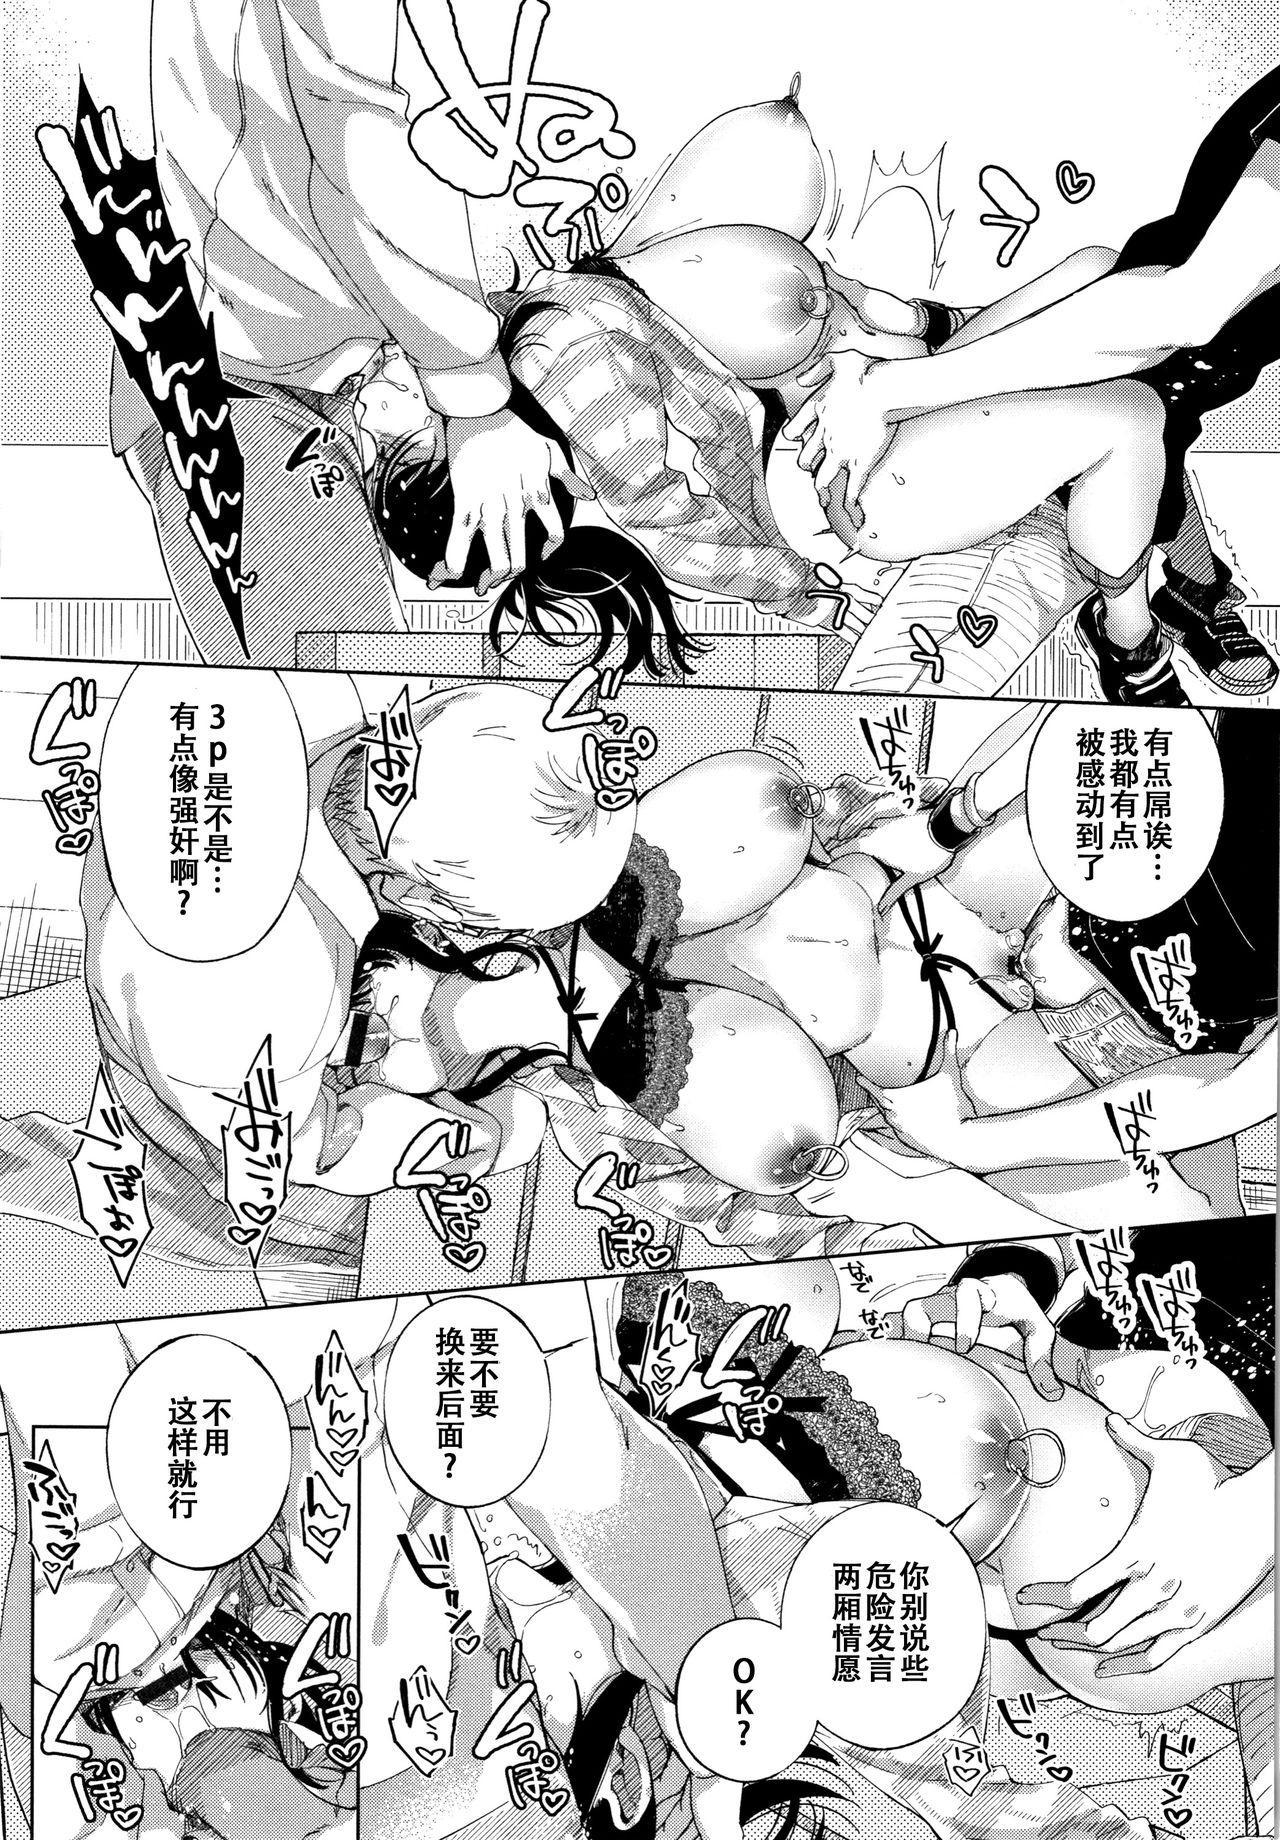 [Achumuchi] Saijaku Gal wa Ikizurai! - The weakest pussy is hard to go.ch.1-3 [Chinese] [战栗的玻璃棒汉化] [Ongoing] 35